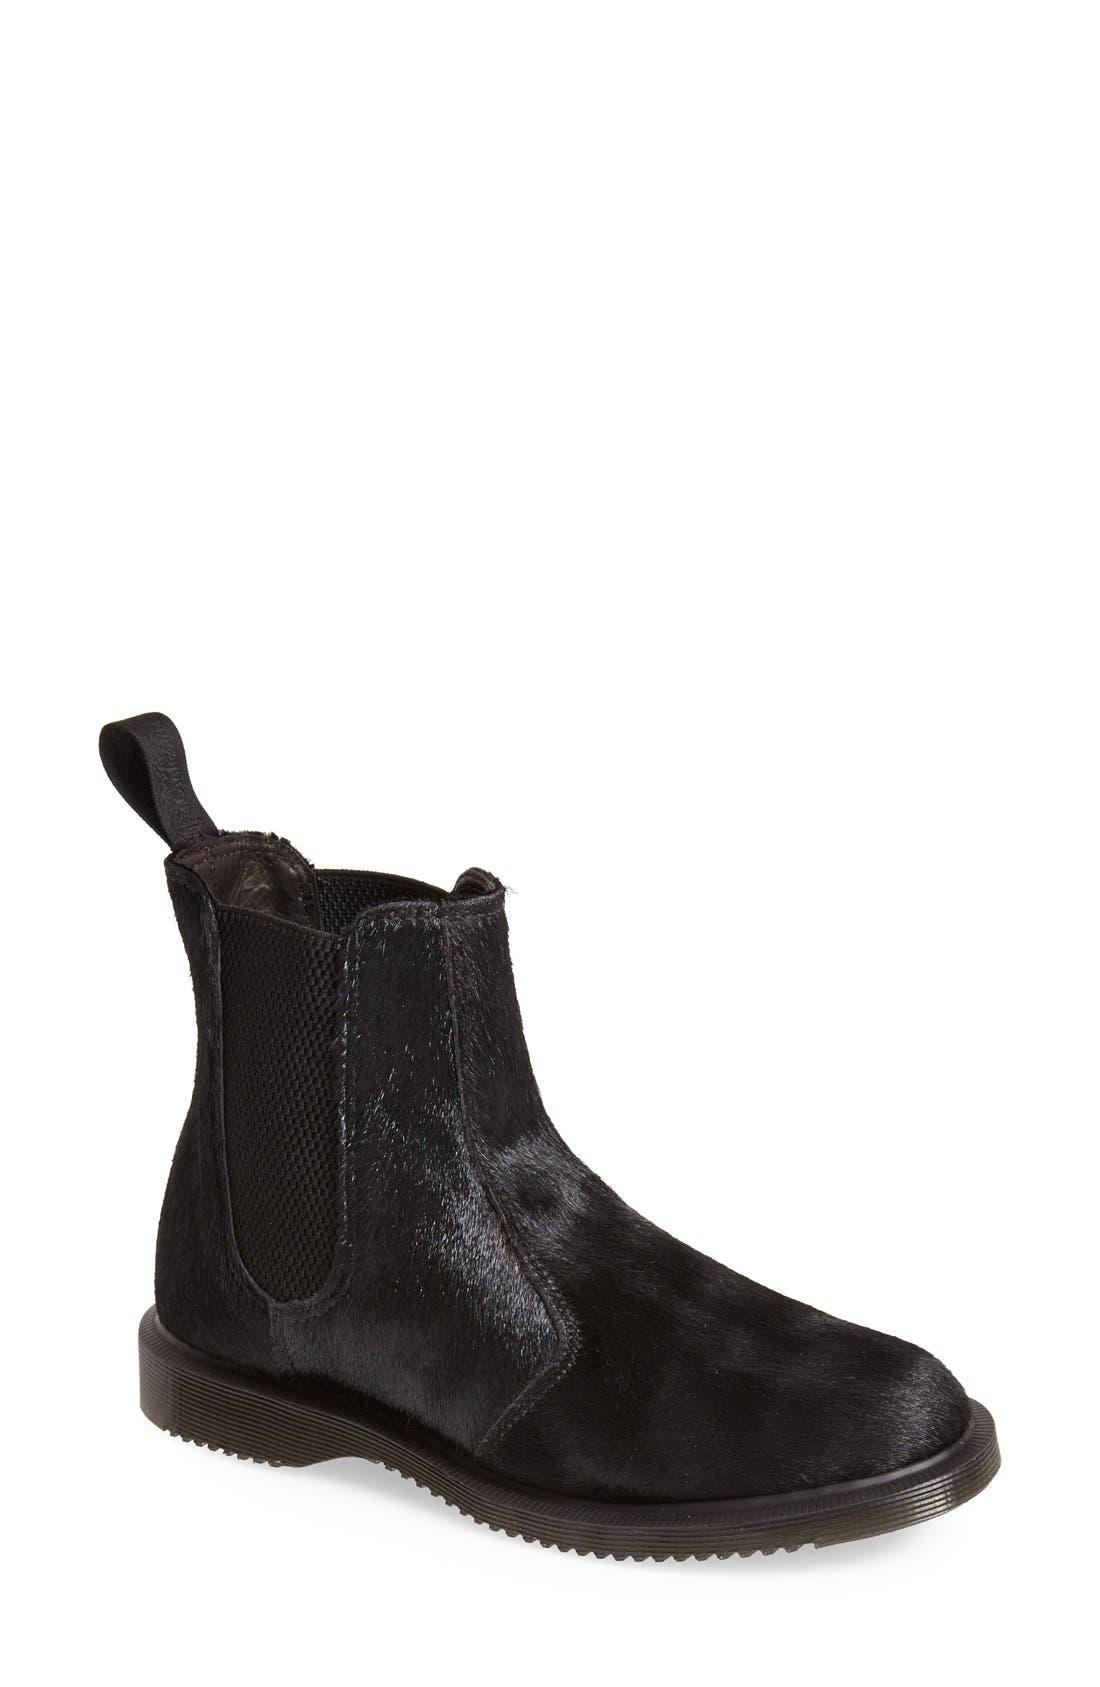 Main Image - Dr. Martens 'Flora' Calf Hair Chelsea Boot (Women)